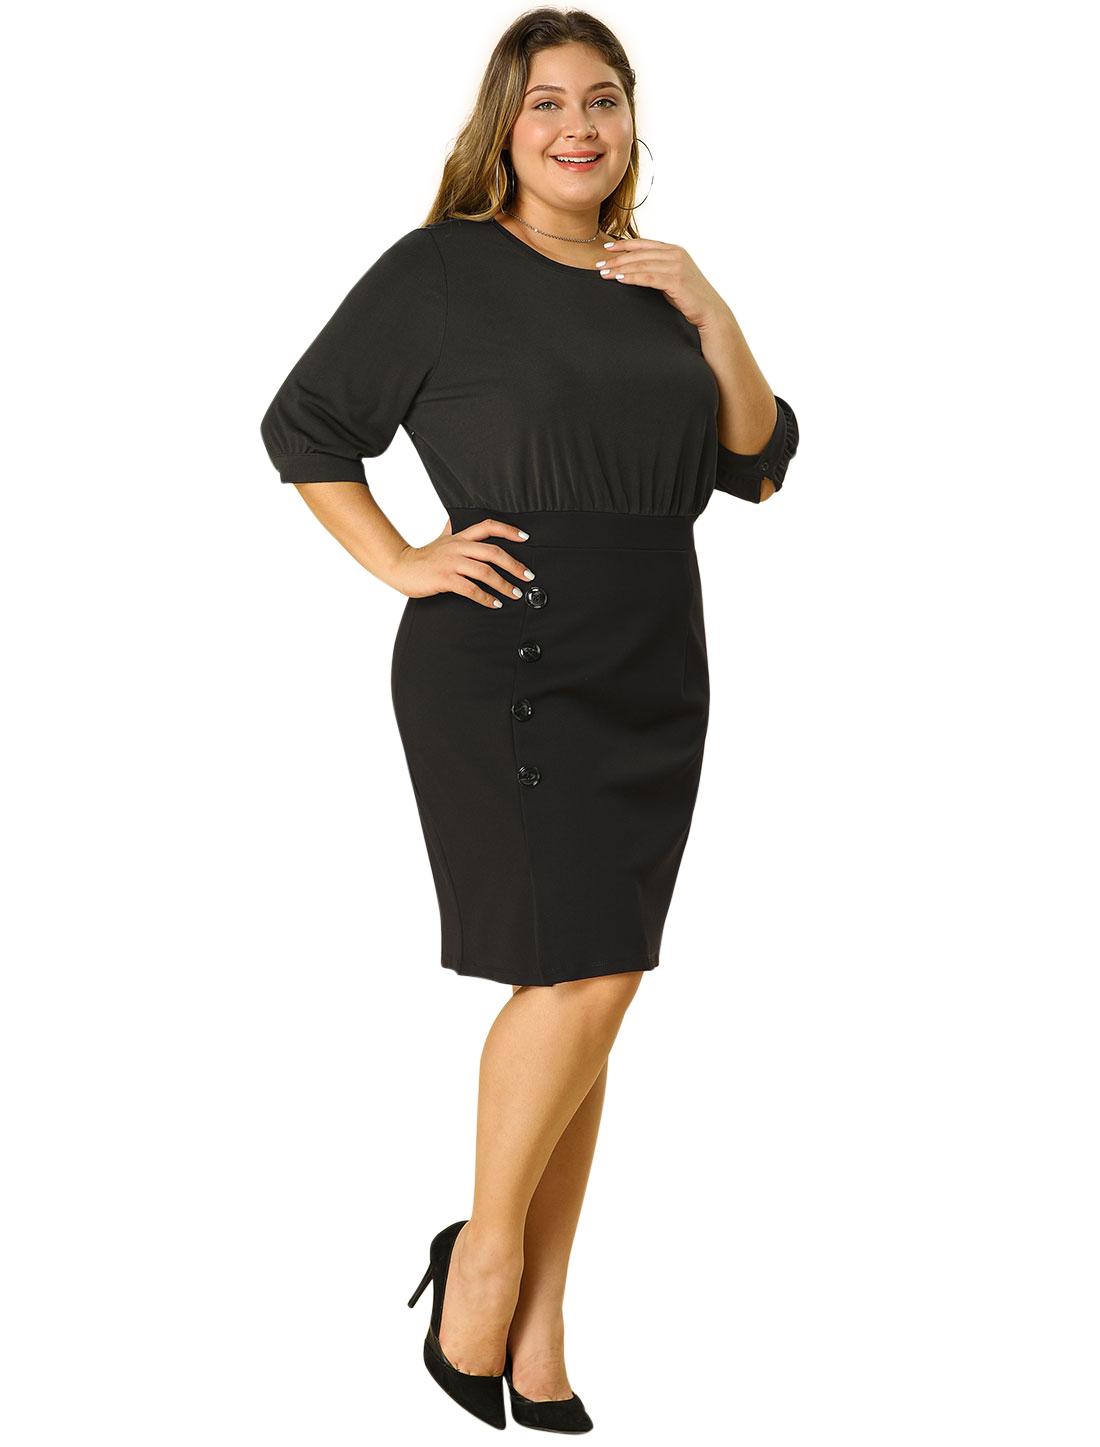 Women's Plus Size Office Work Bodycon Button Pencil Dress Black 3X